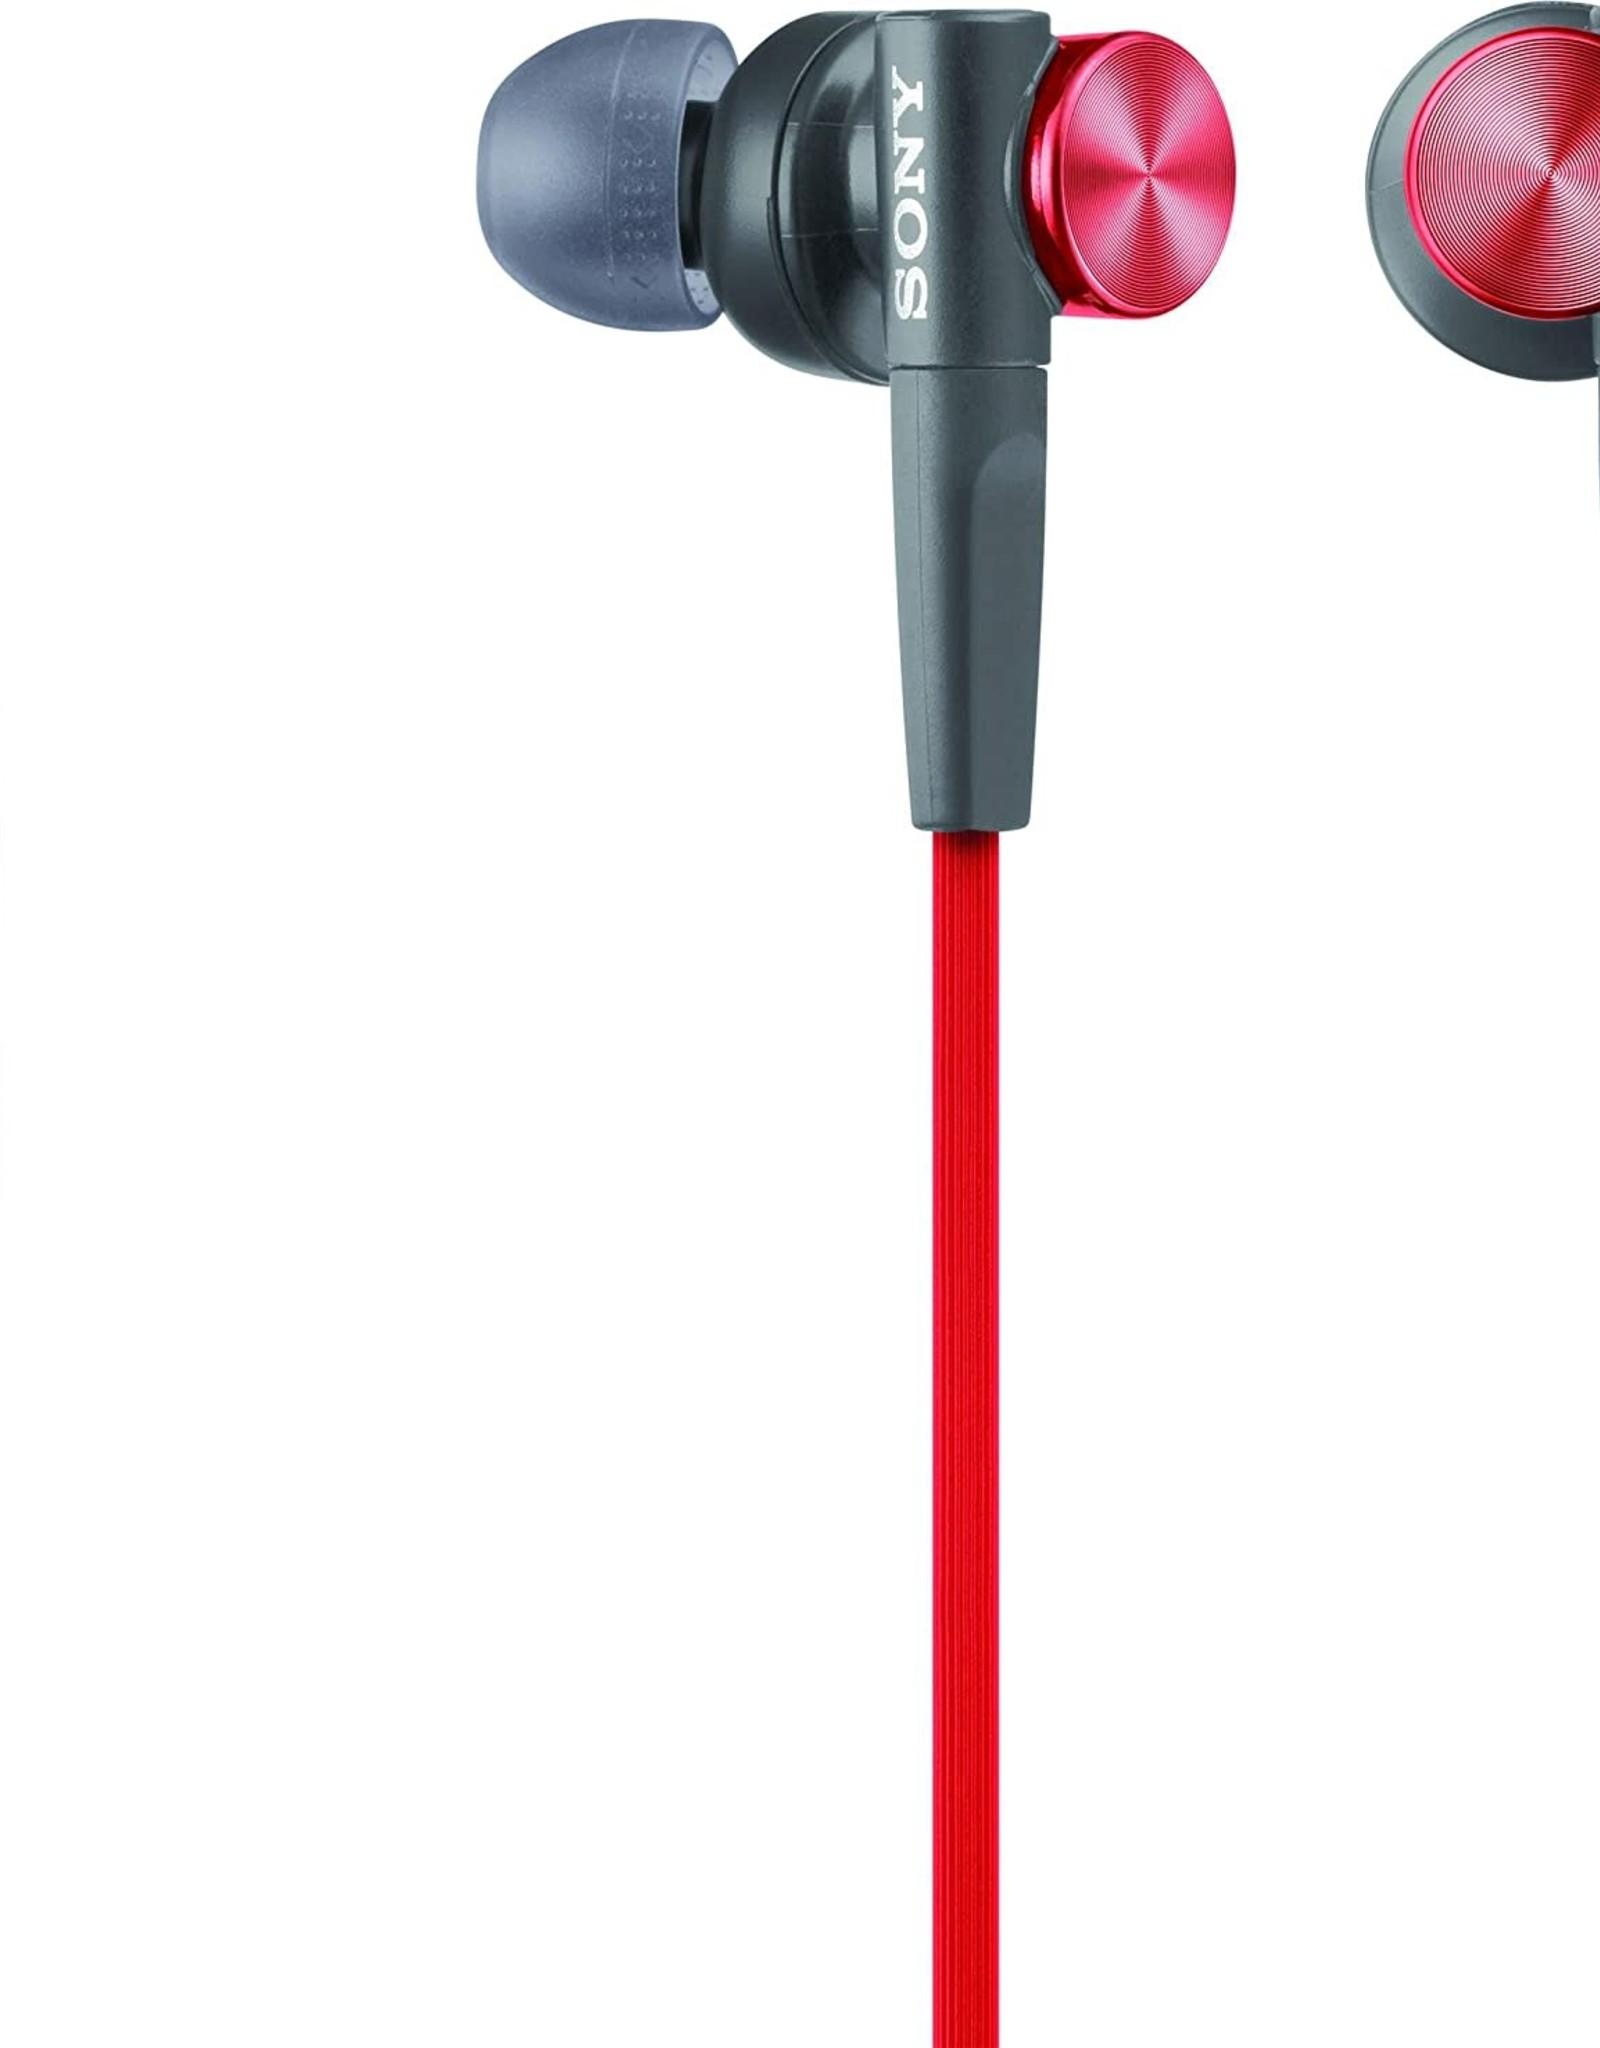 Sony SO - Sony | In-ear Extra Bass Earbud Headphones (Red) | MDRXB50AP/R